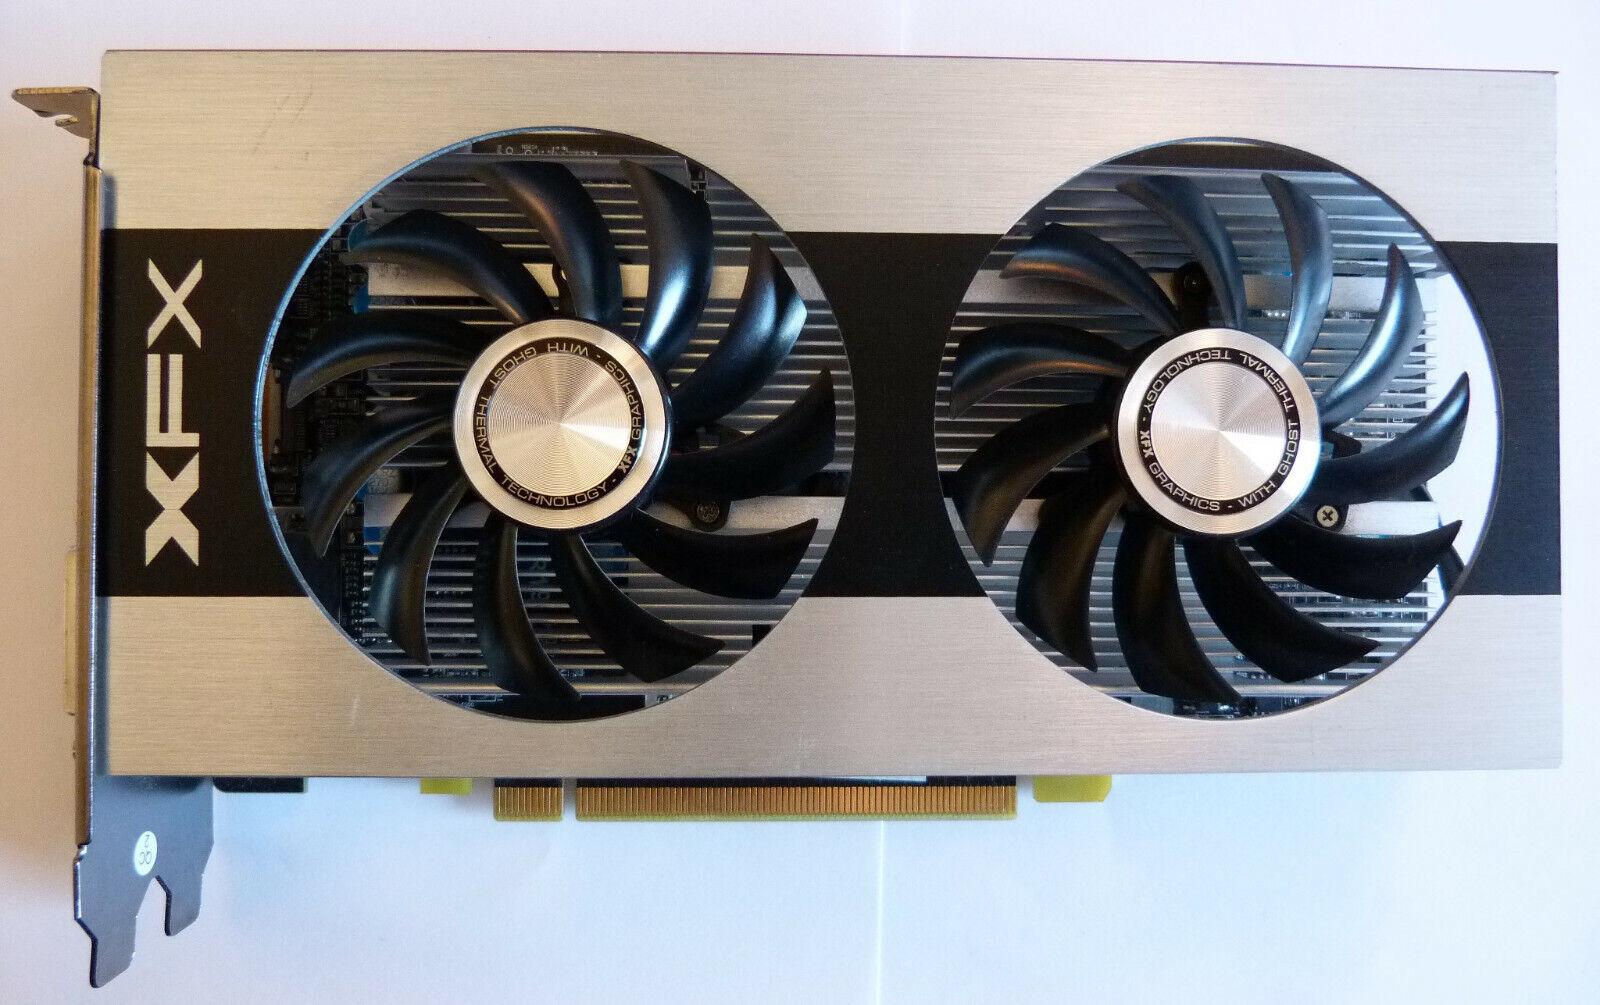 XFX Extreme Gaming Radeon 7790 1 GB DDR5 PCI-E Grafikkarte in OVP